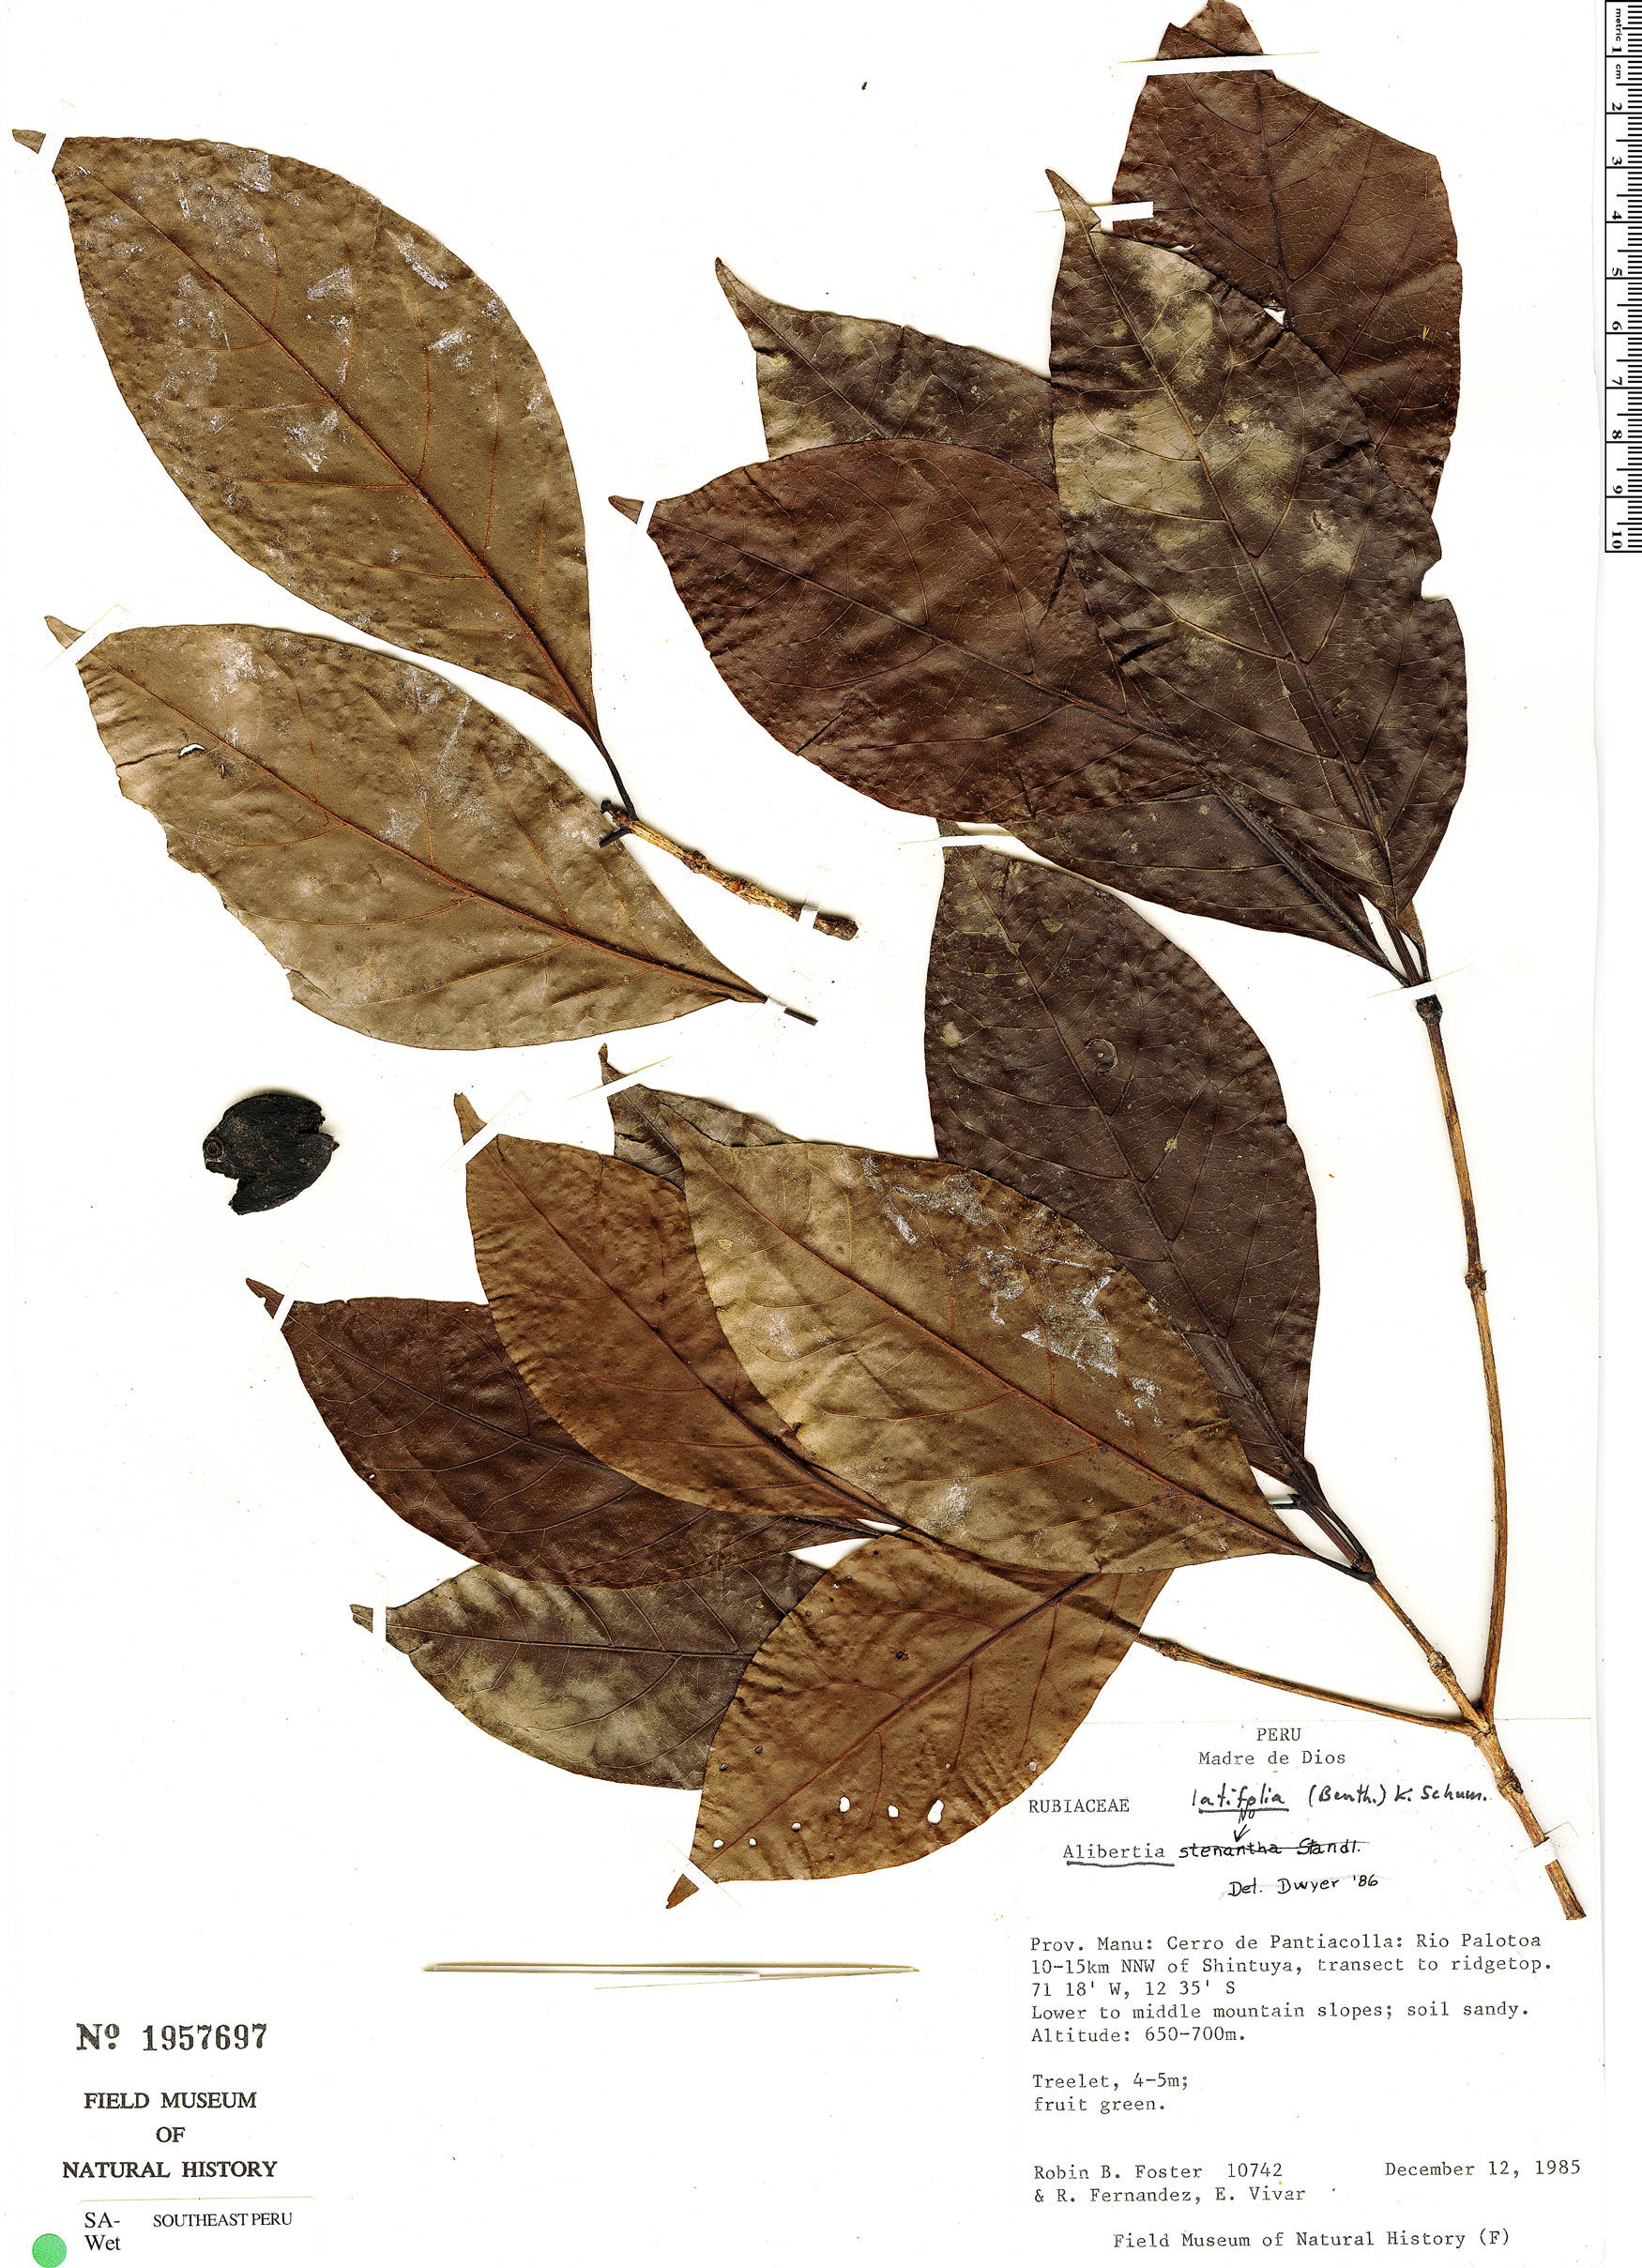 Espécimen: Cordiera hadrantha